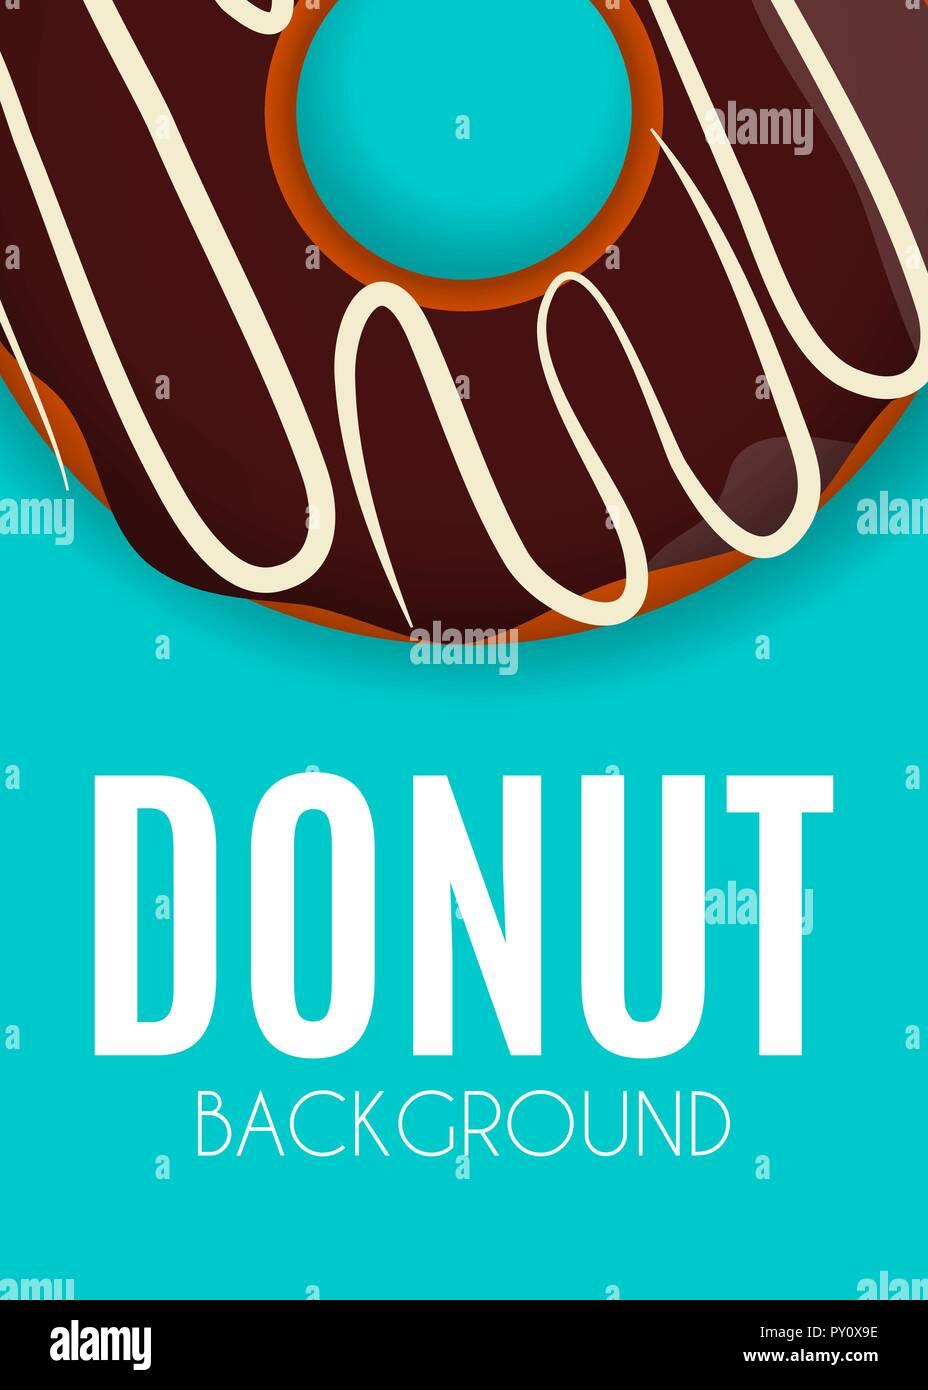 donut background.html